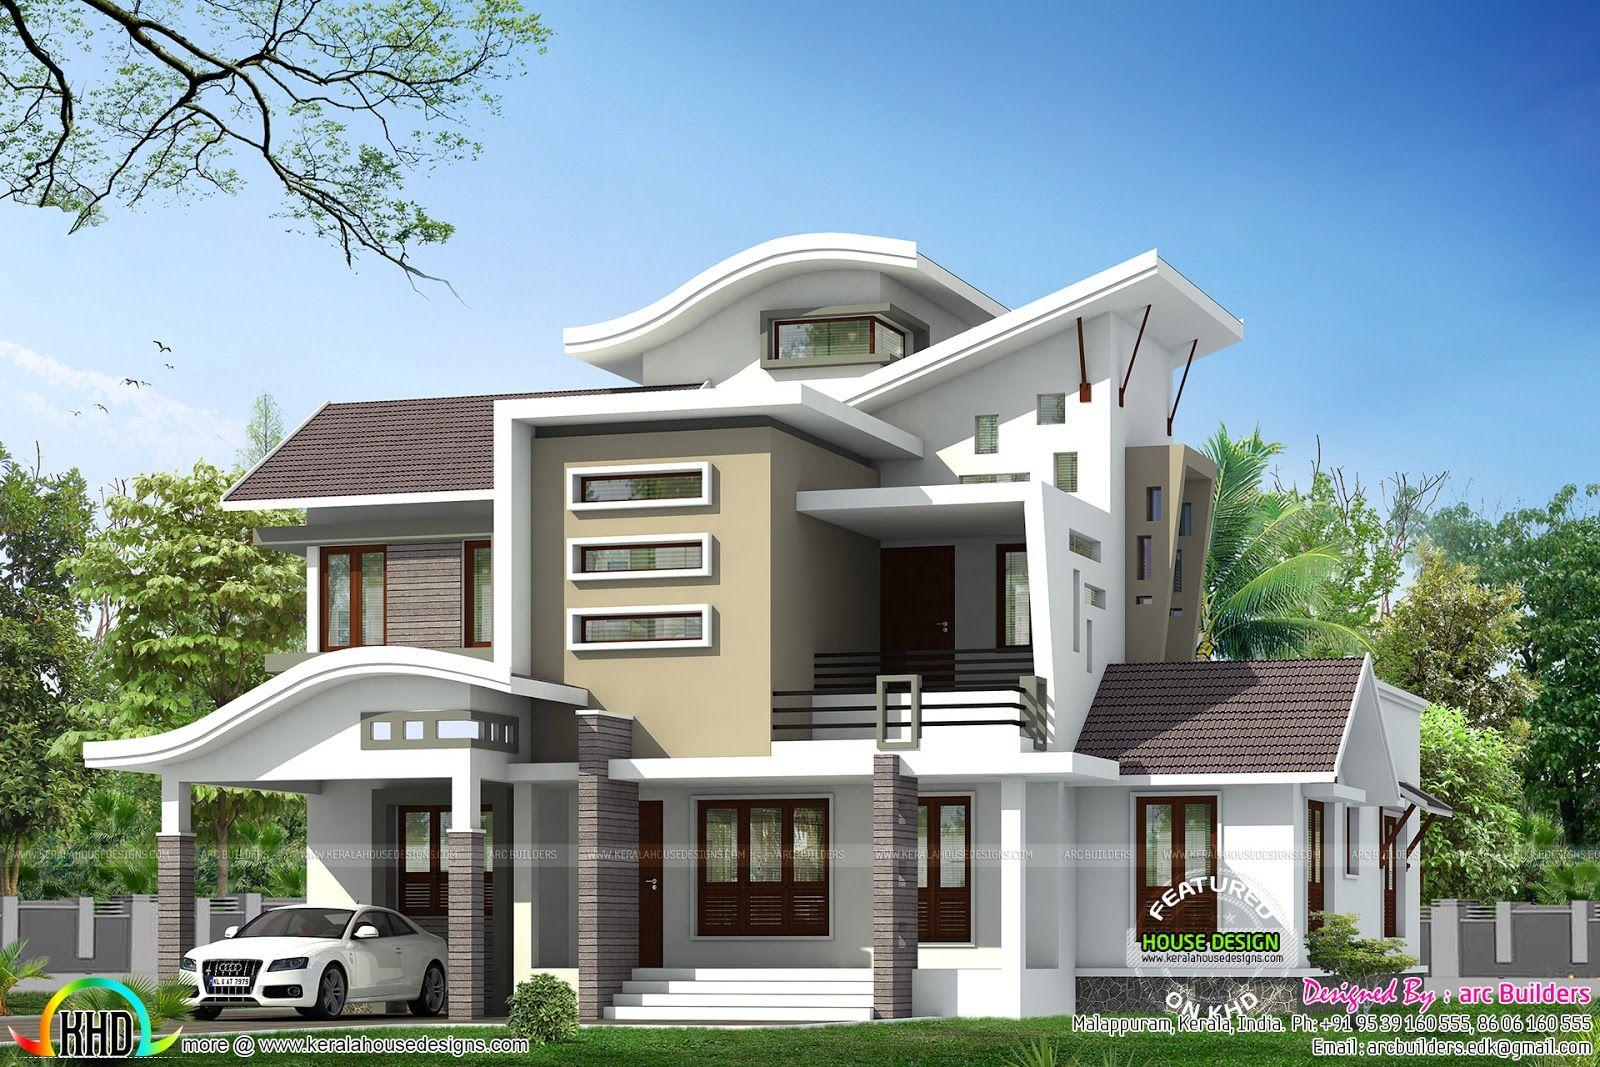 Unique ultra modern contemporary architecture kerala bungalow house design duplex also   lakhs cost estimated sq ft home in rh pinterest